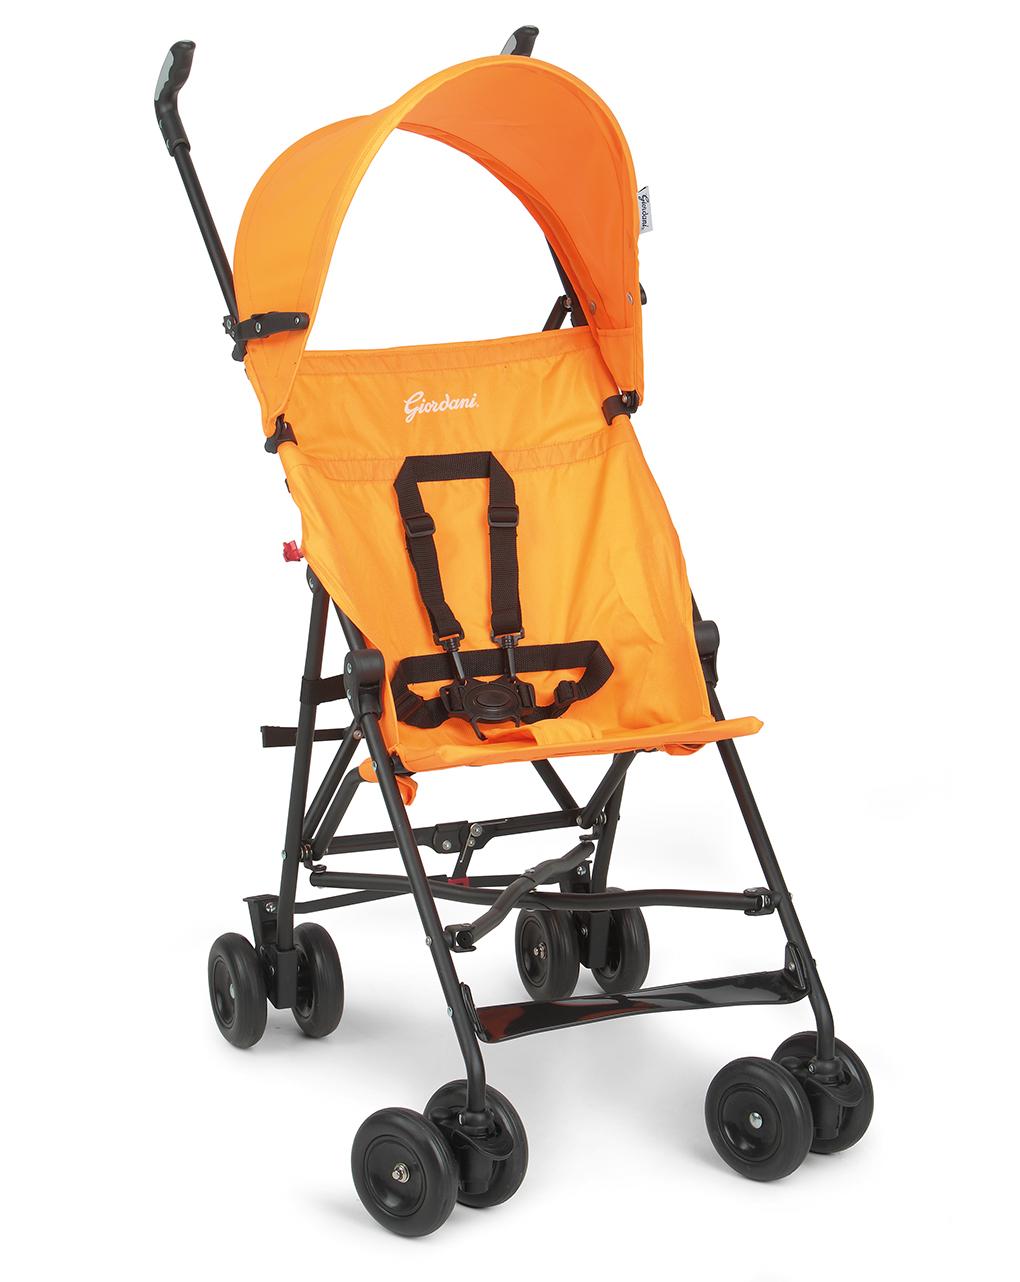 Giordani Καρότσι Jolly Orange